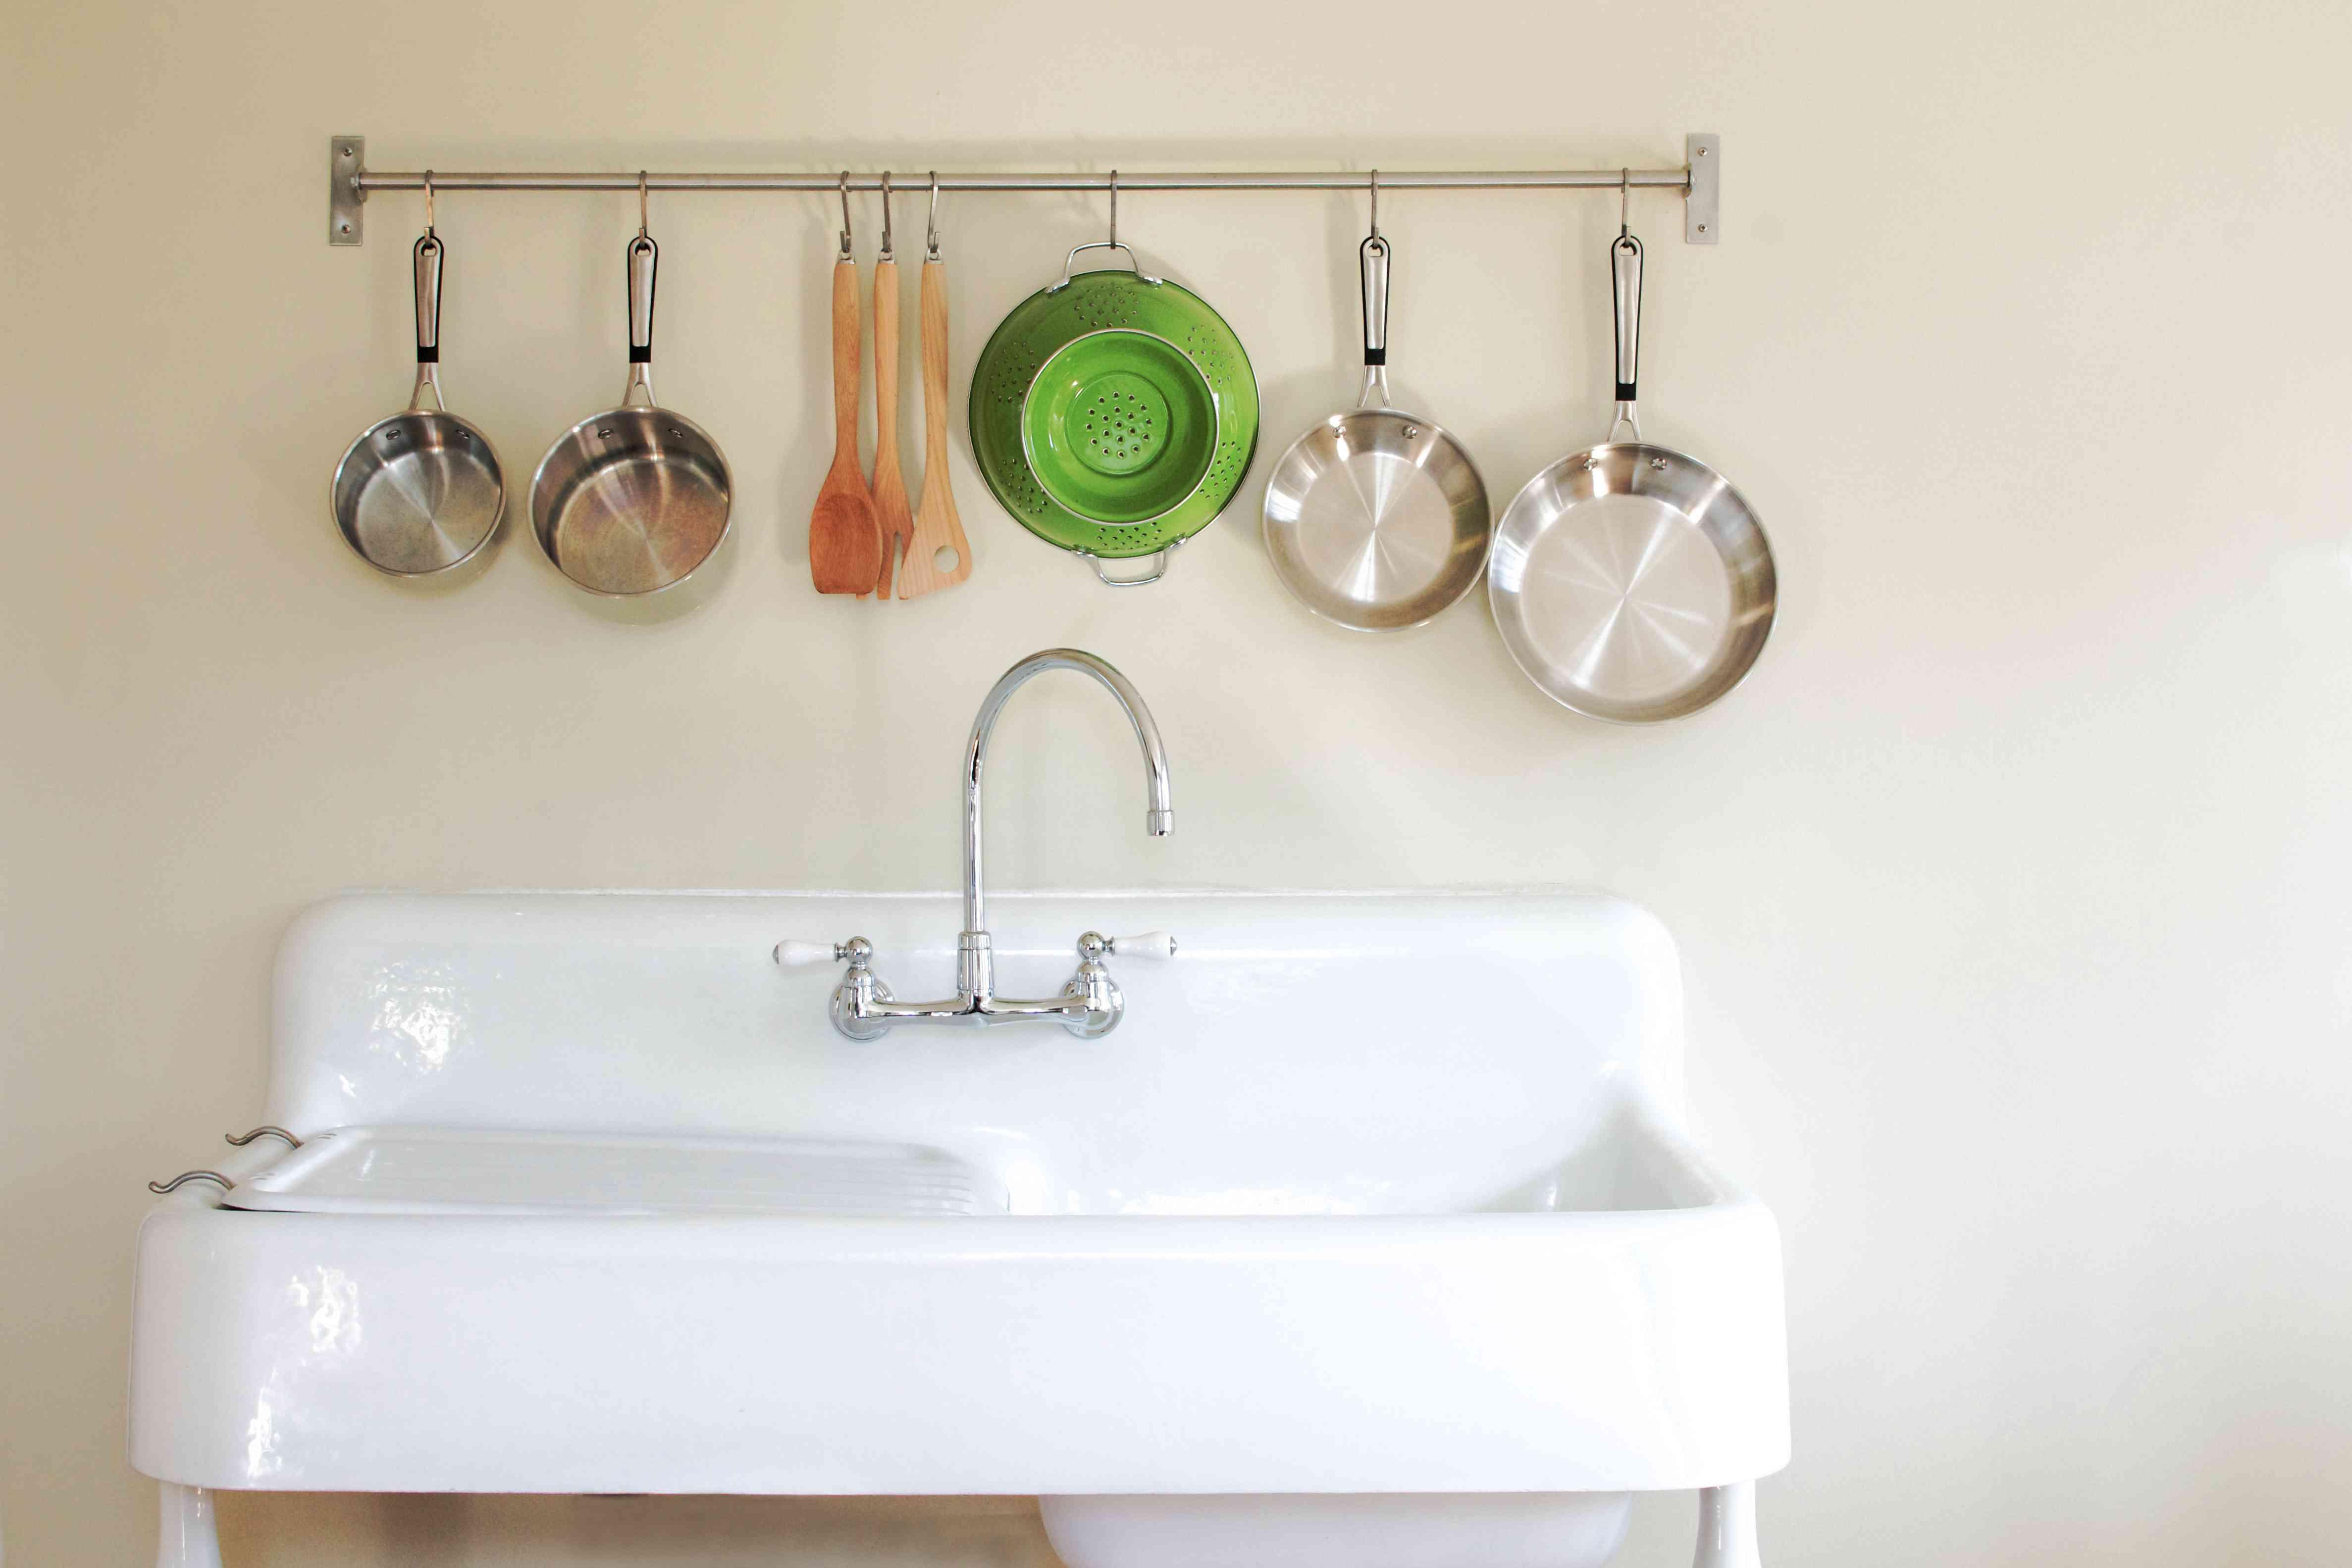 Antique kitchen farm sink with hanging pots